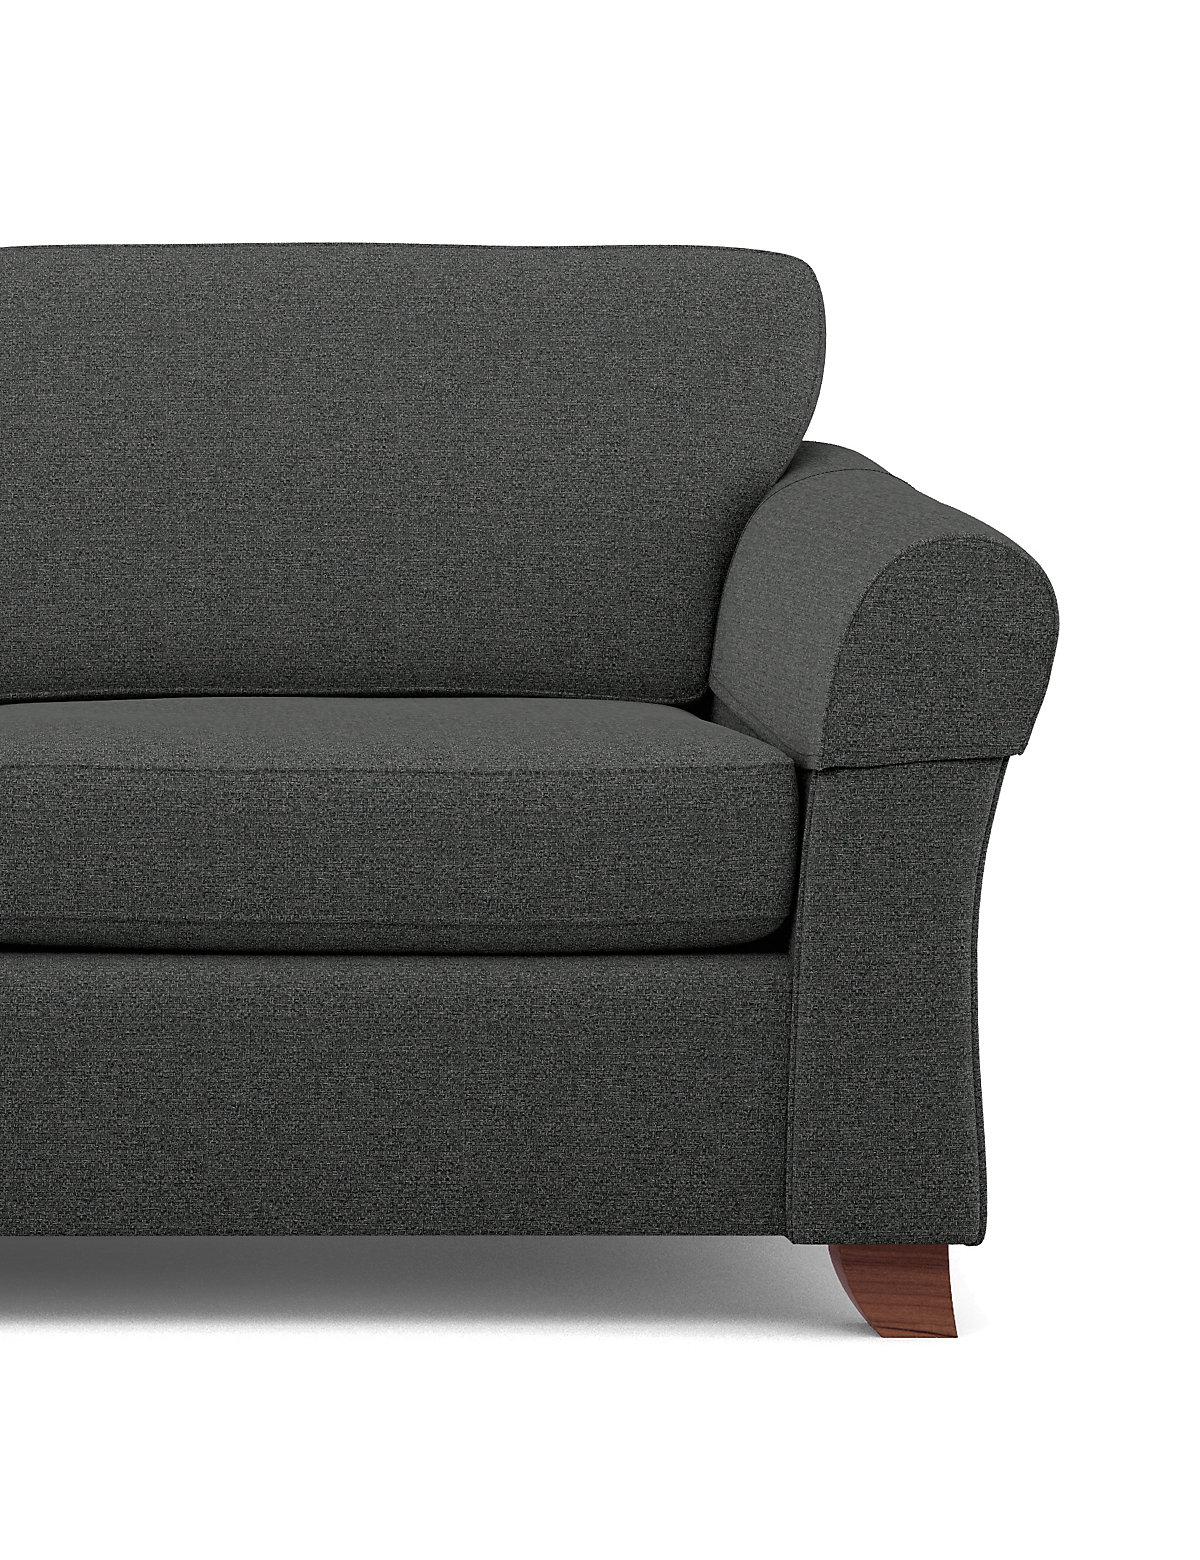 abbey sofa arm caps